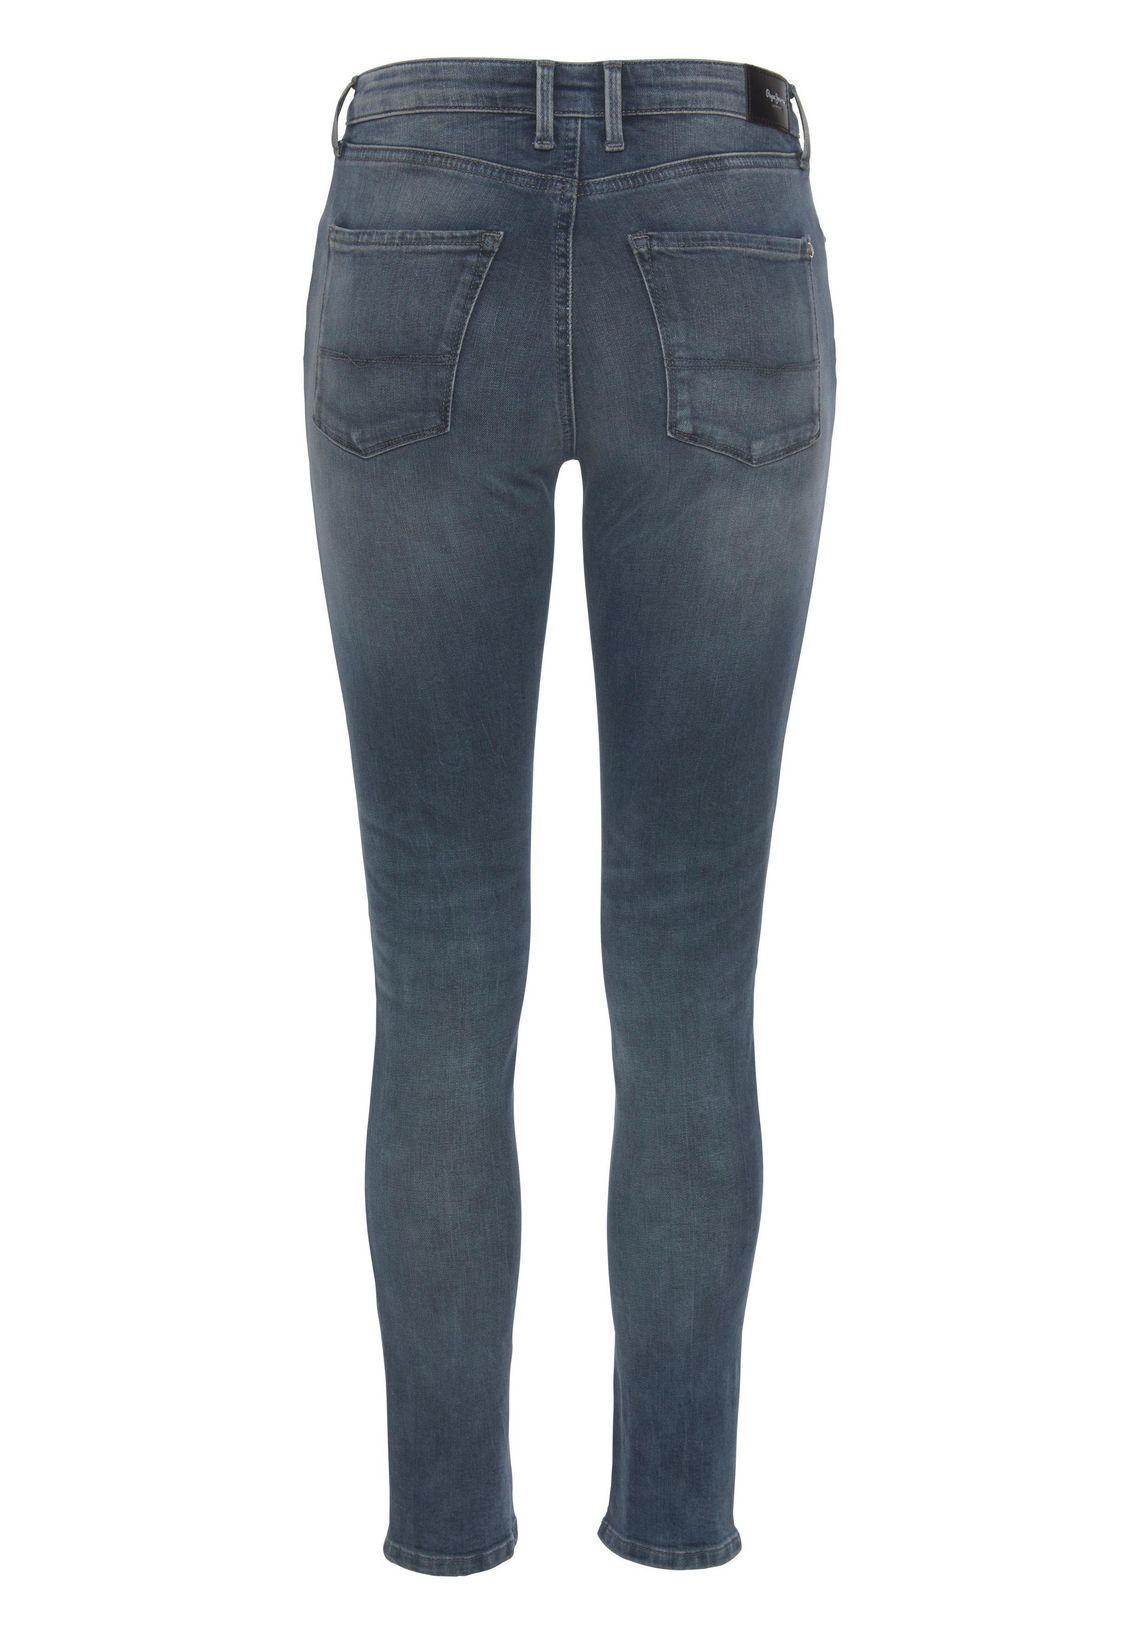 Pepe Jeans Skinny Regent Online Kopen Blue-used ocS6O5q3